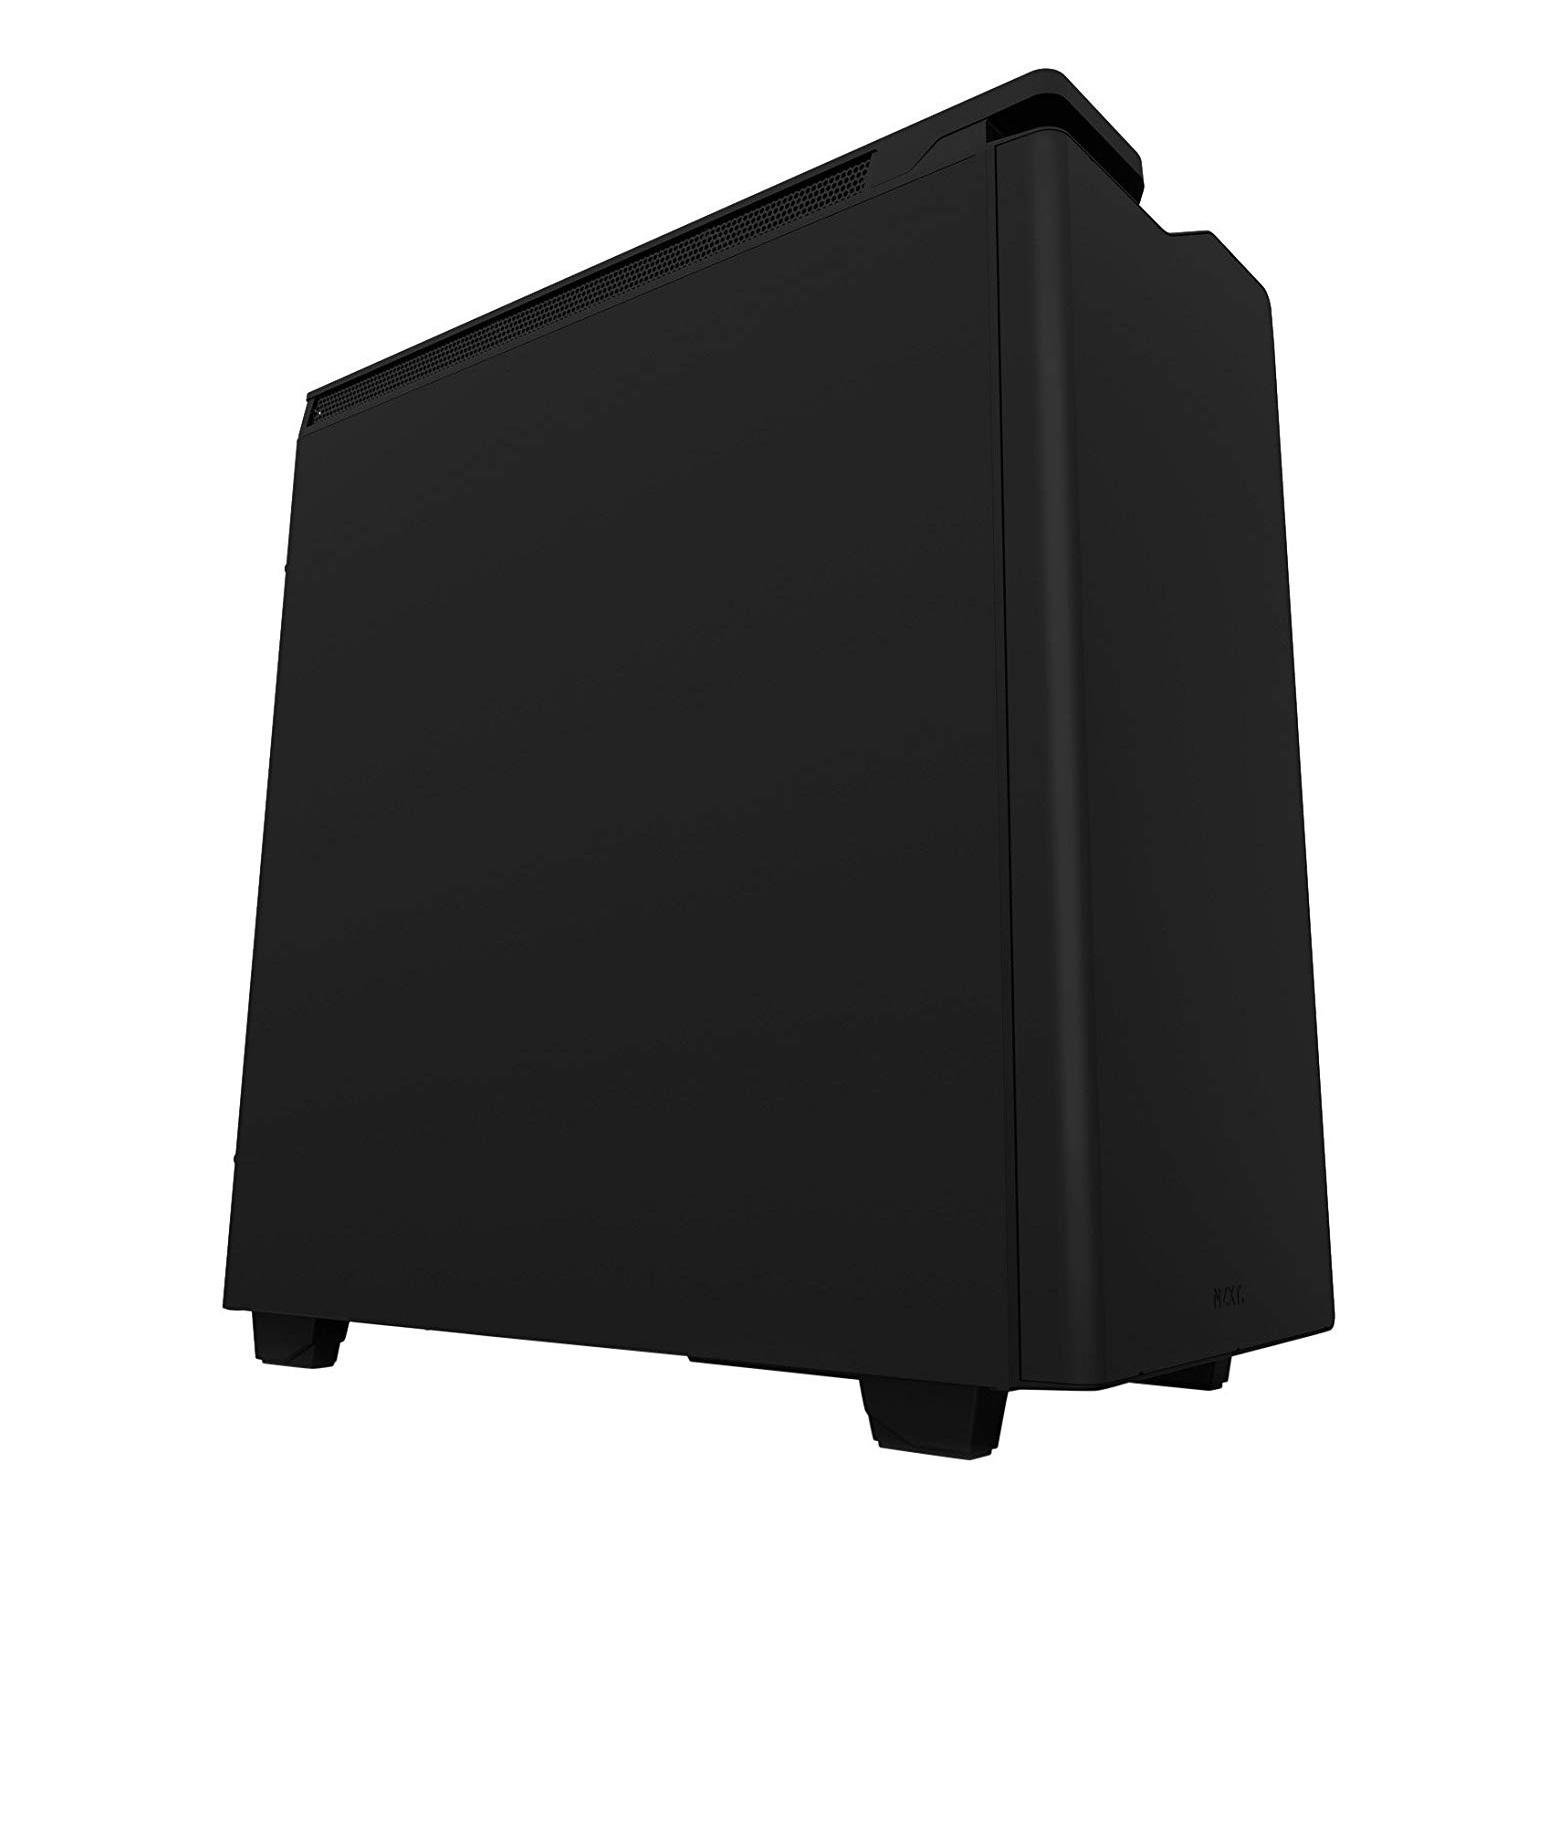 Cassa per PC - da Gaming, Nero NZXT CA-H442C-M8